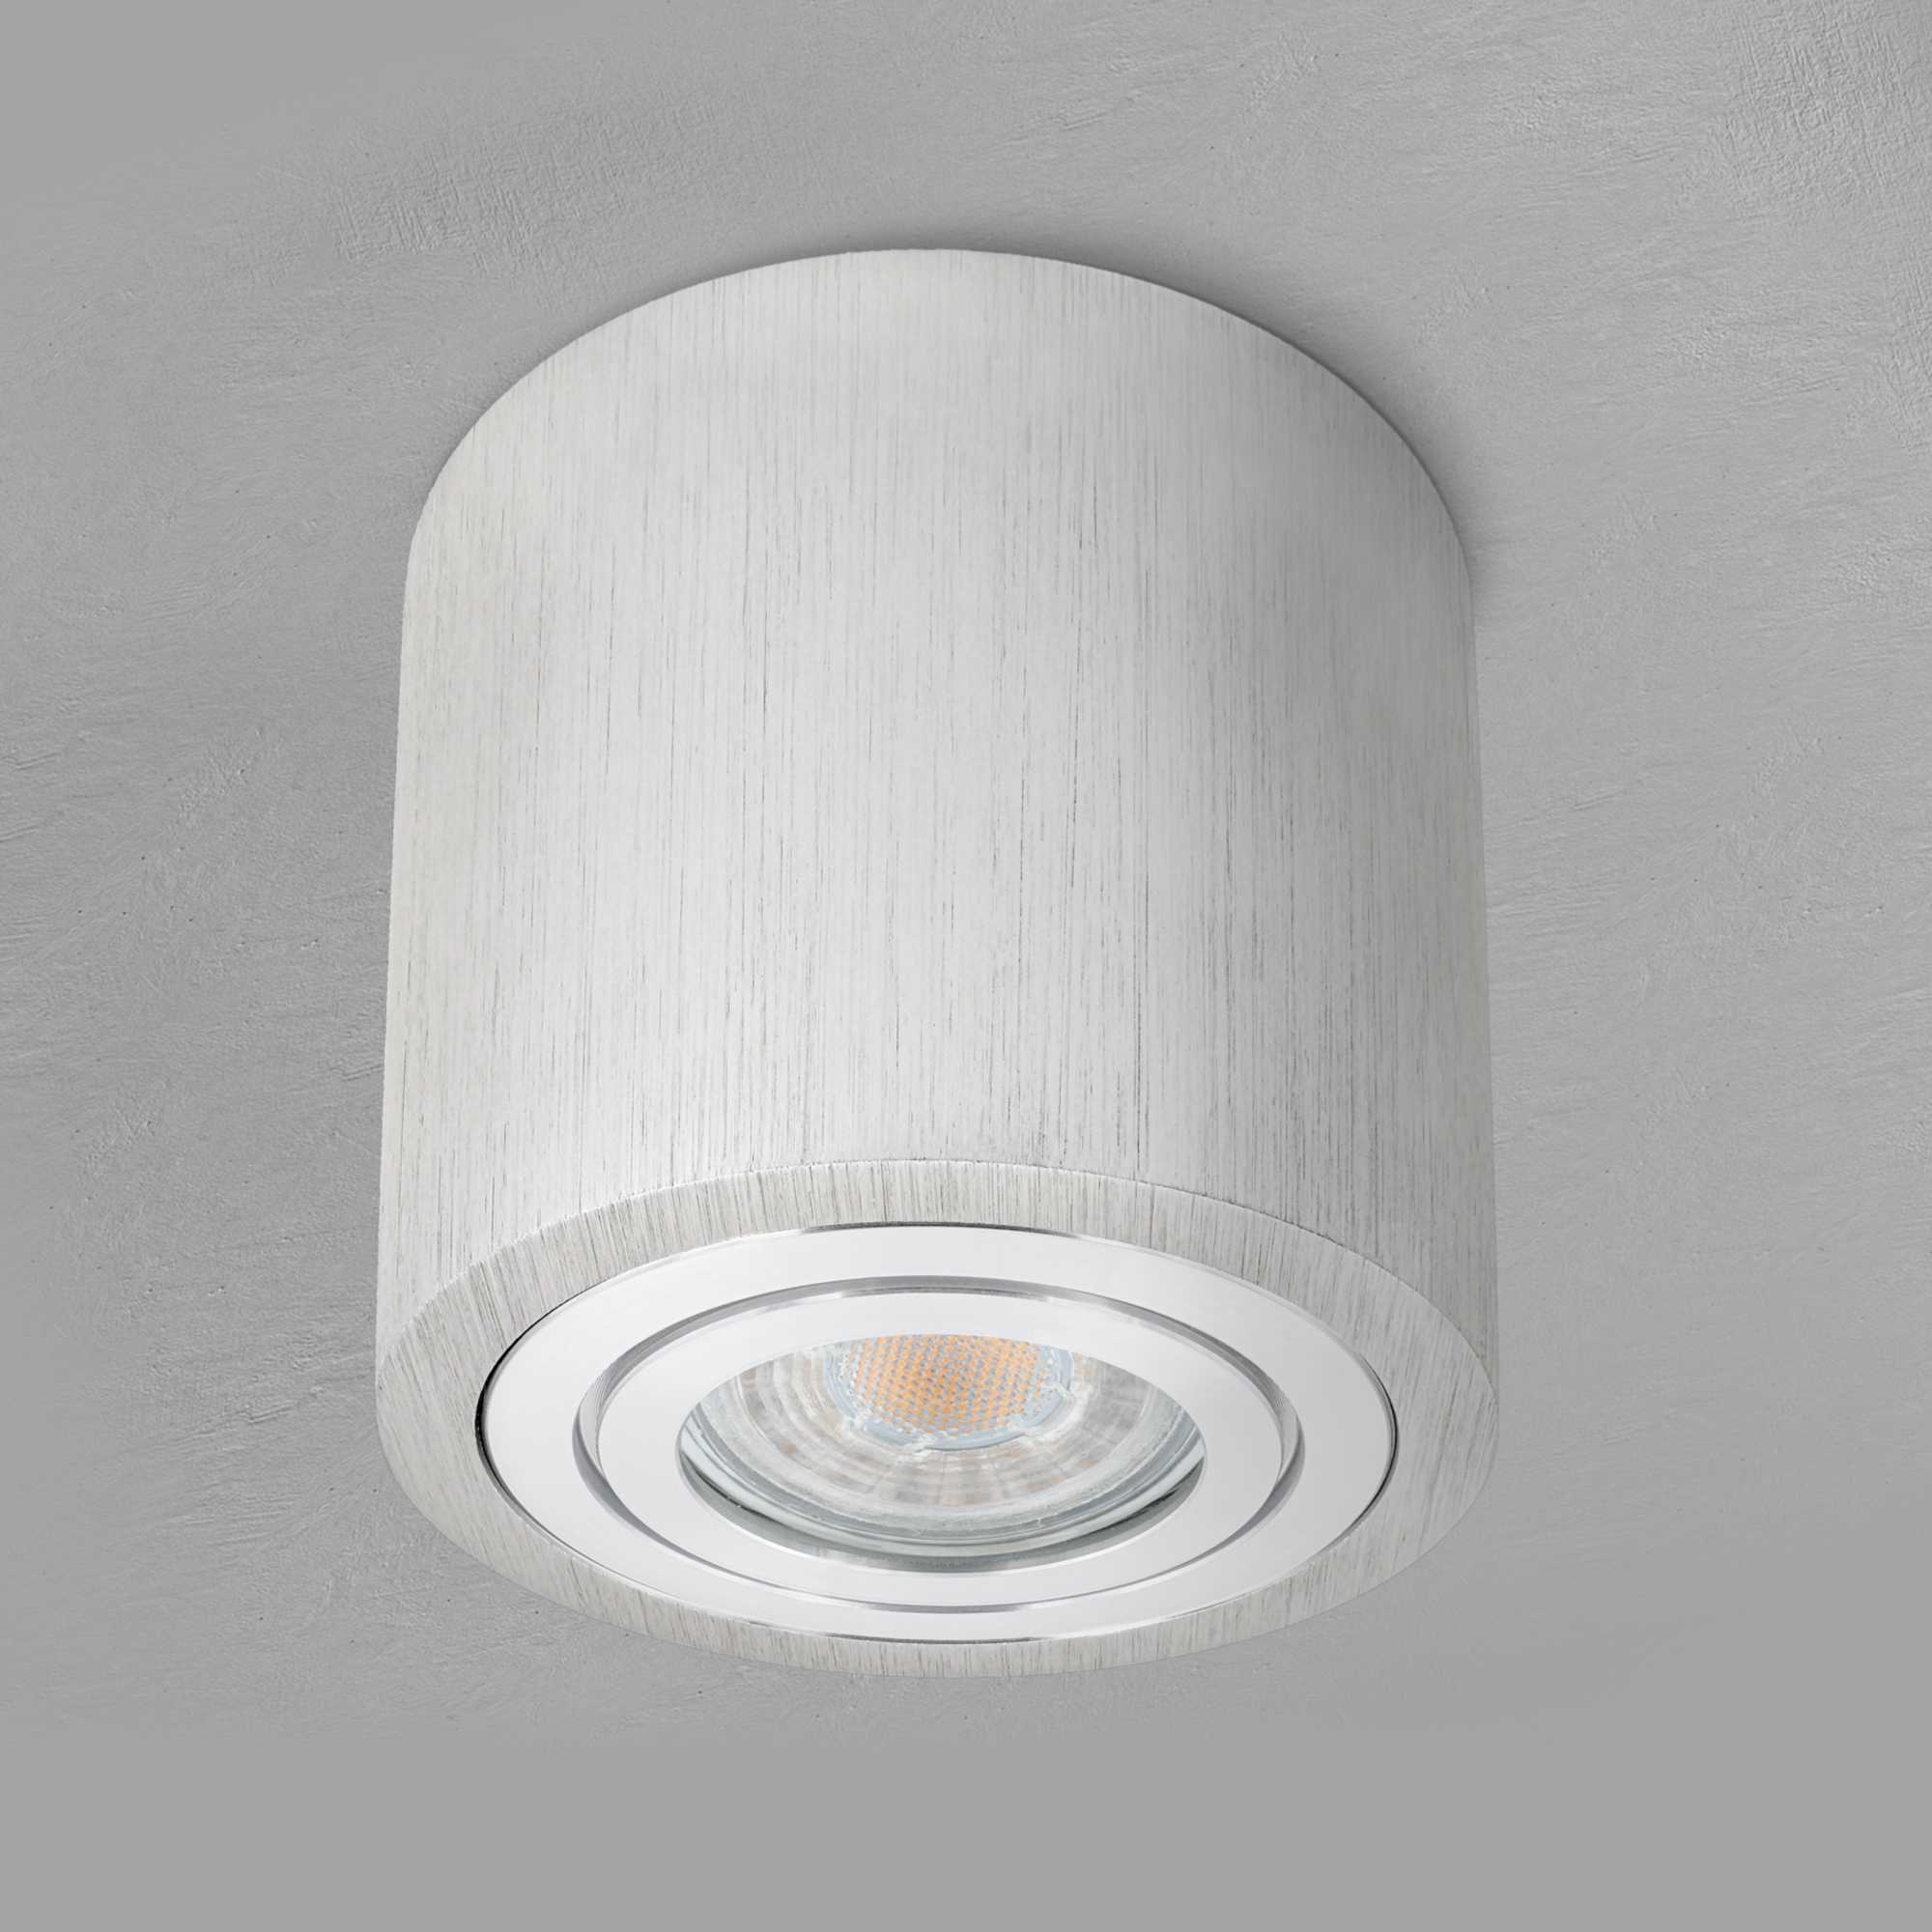 Feuchtraum Bad Aufbaustrahler Alu gebürstet IP8 inkl. LED GU8 8W  neutralweiß